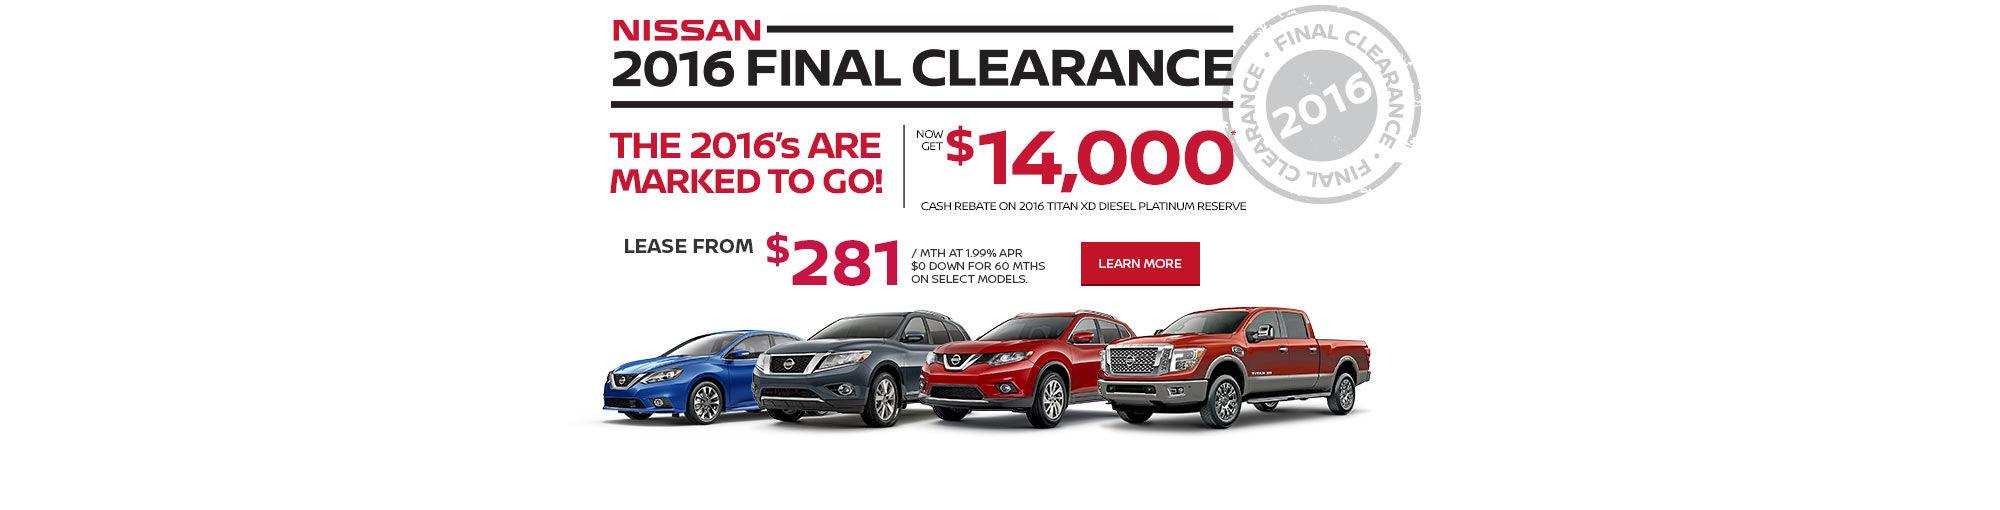 Nissan 2016 Final Clearance